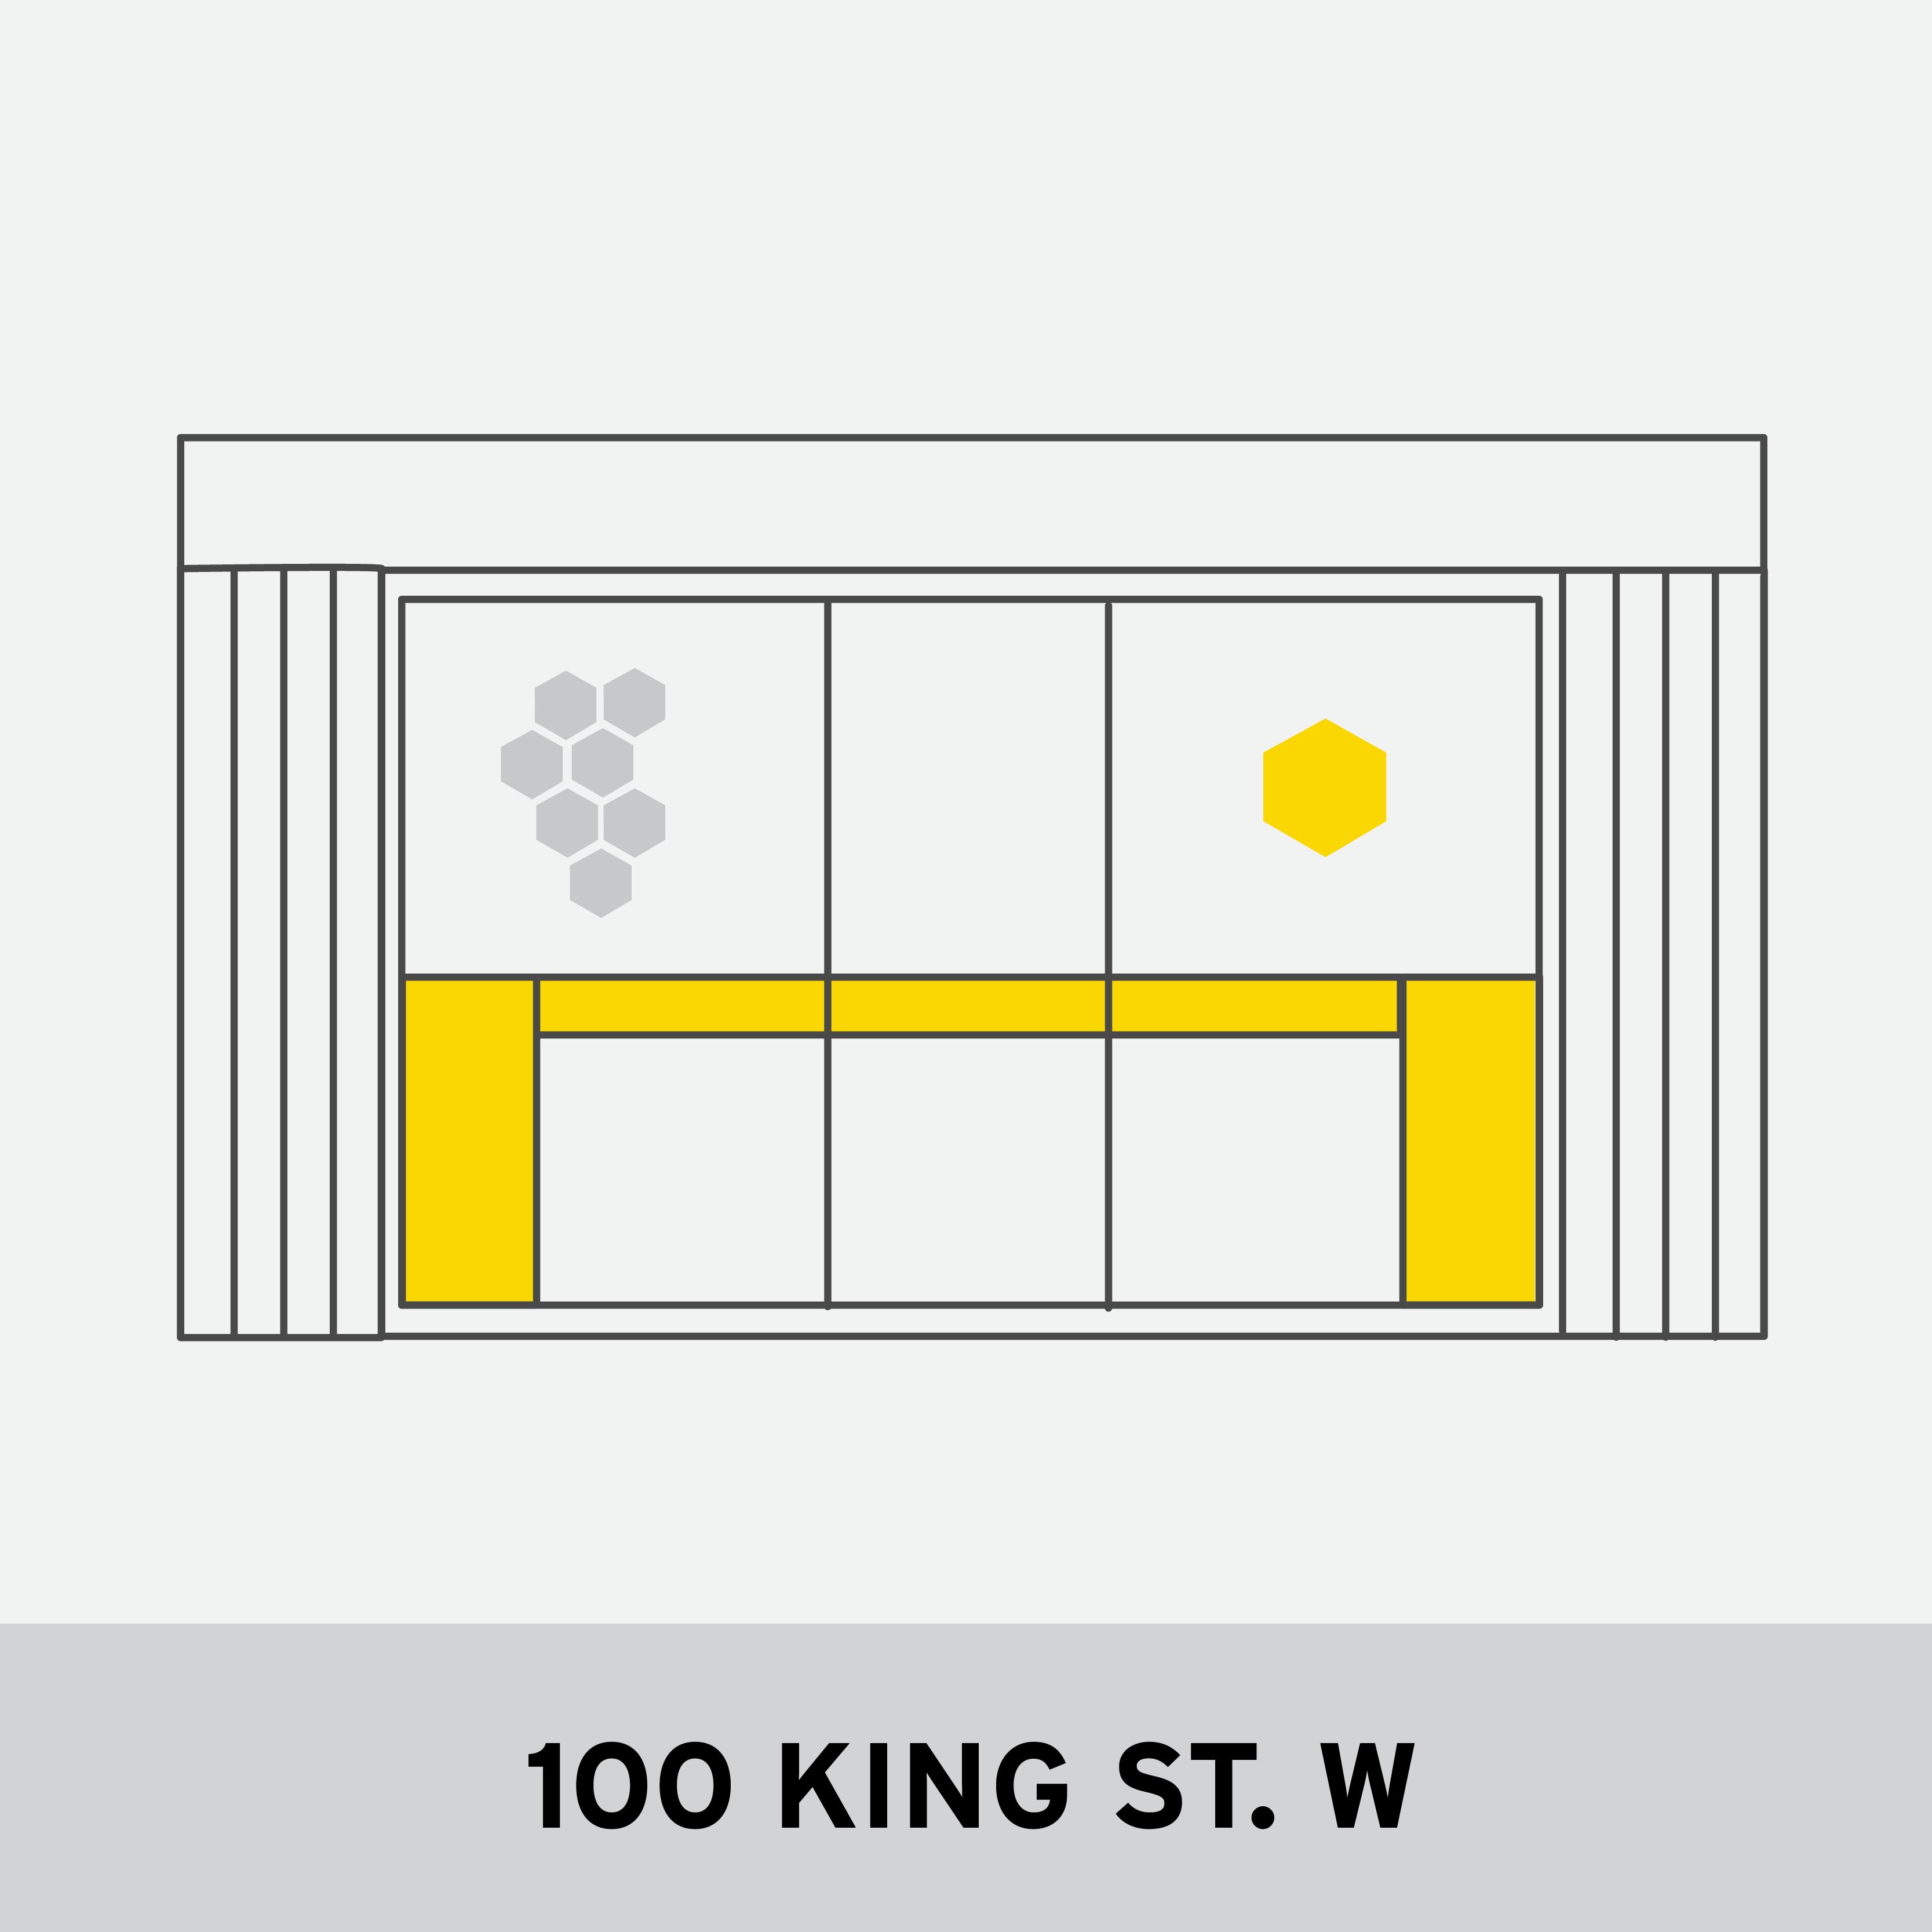 100 KING ST. W